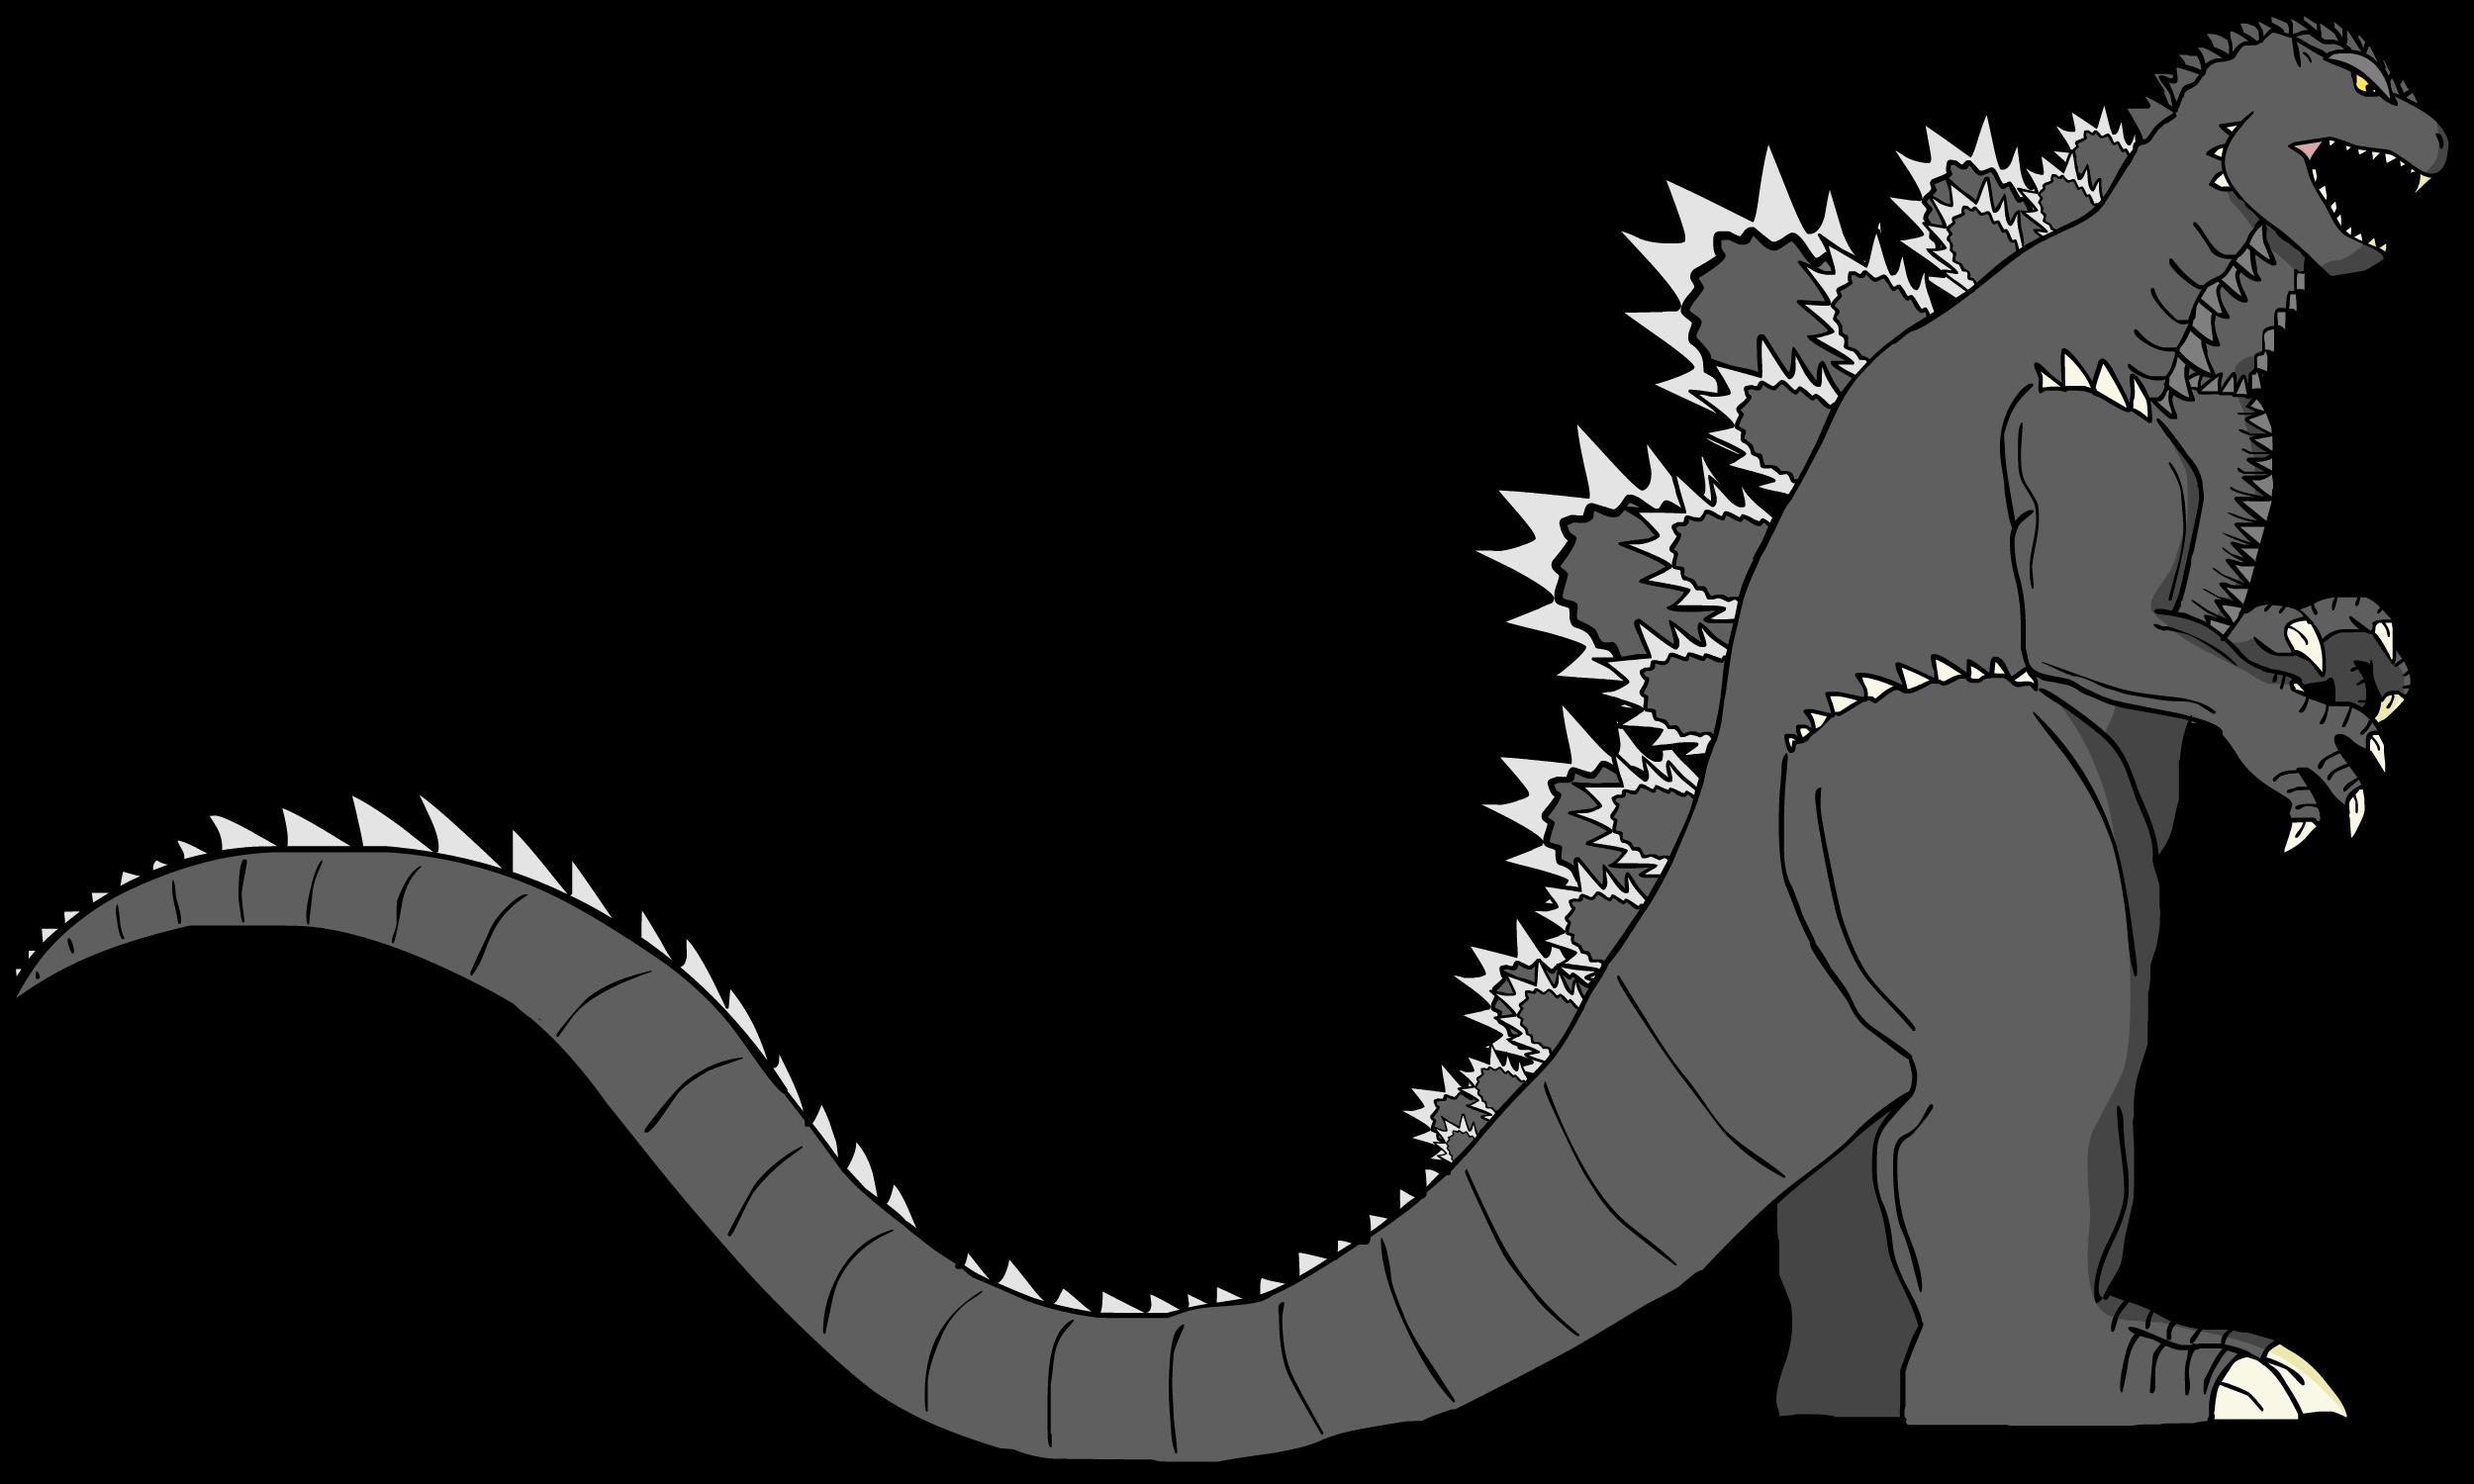 Godzilla's Design (The Wrathful God) by KingAsylus91